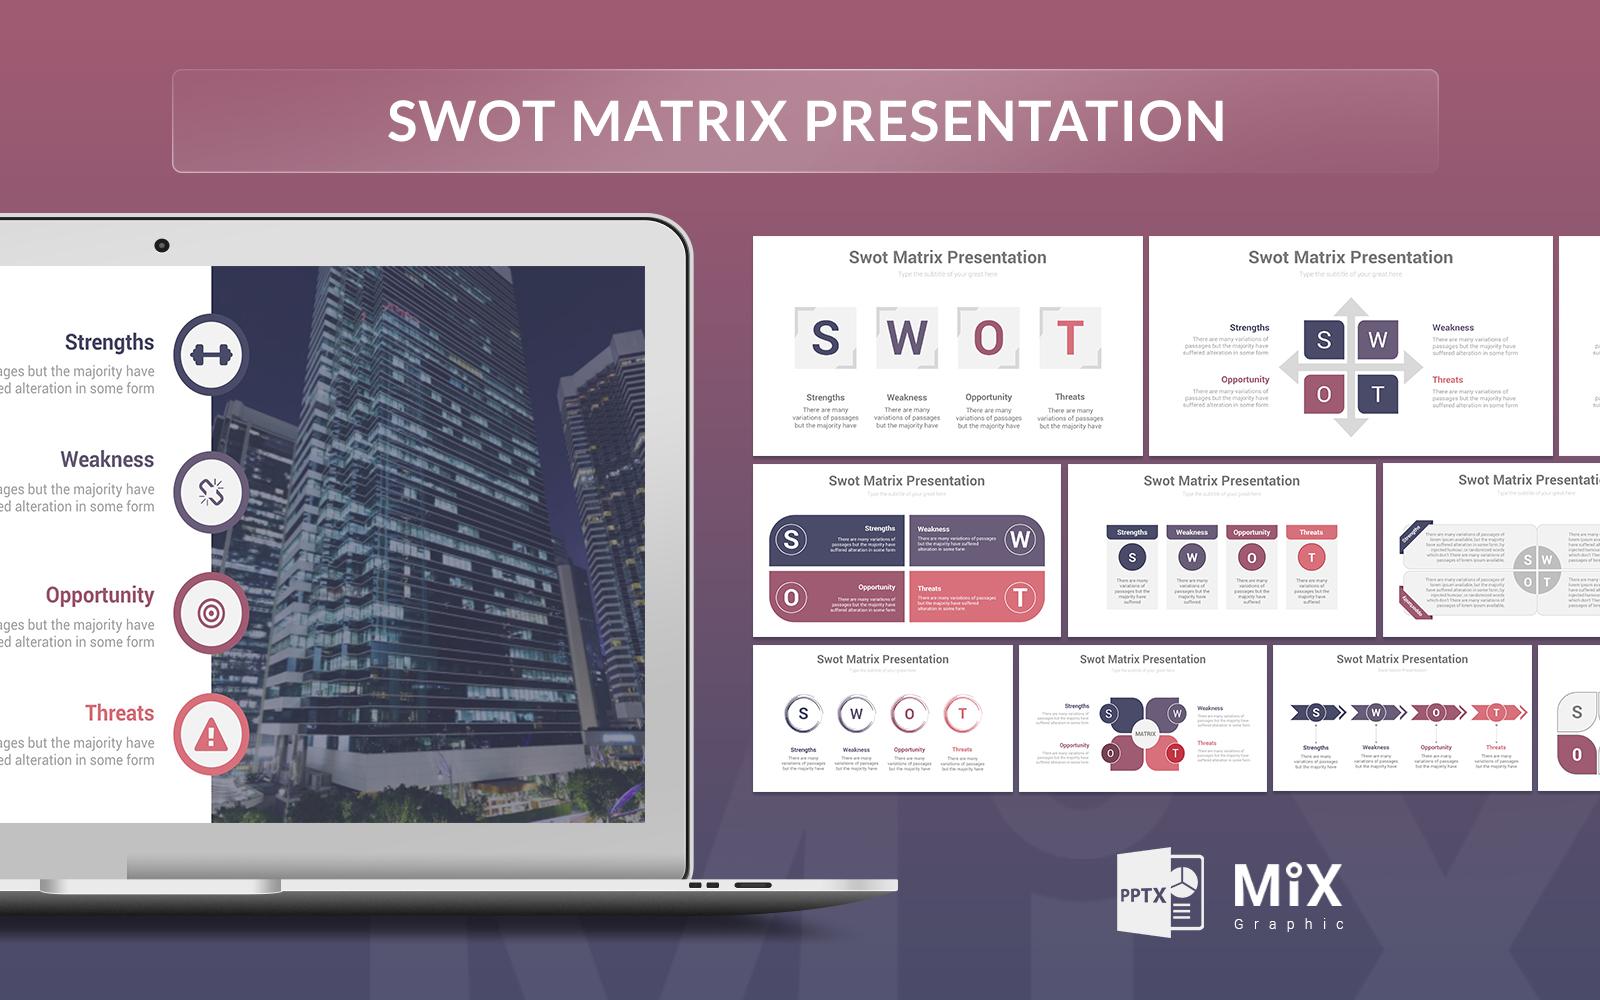 Swot Matrix Presentation PowerPoint Template